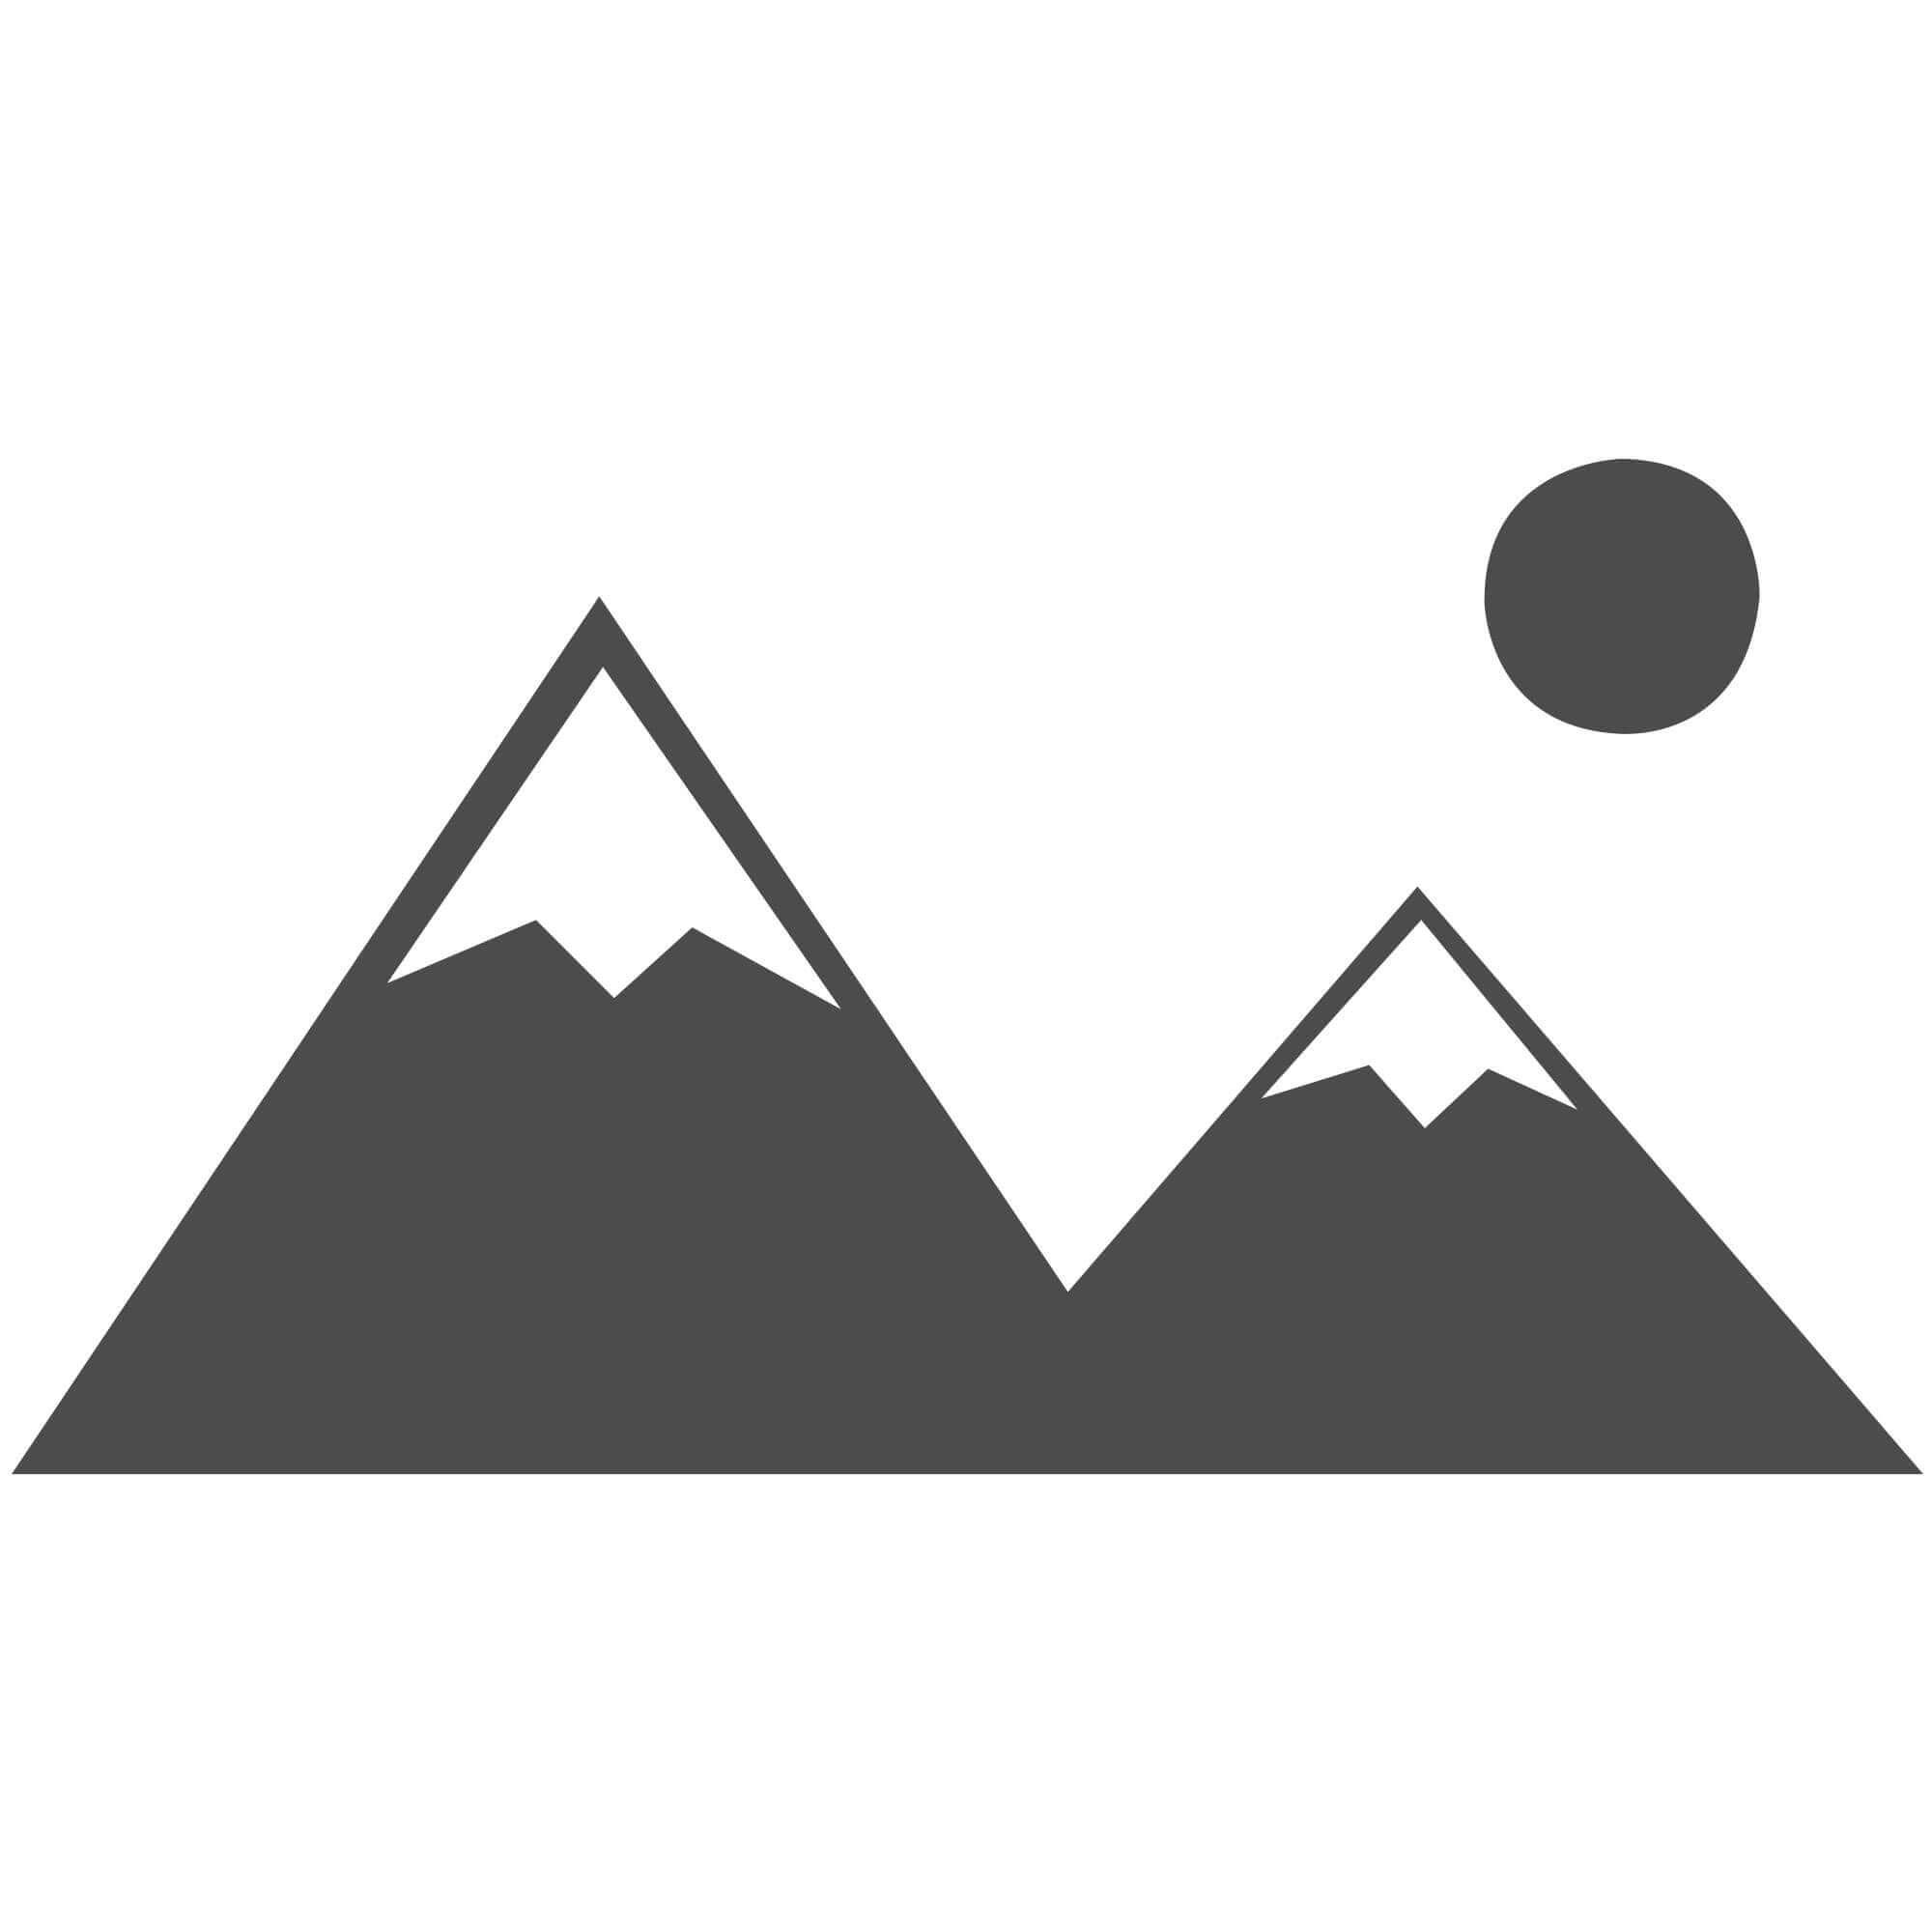 Royal Traditional Wool Rug - Cream Rose-Half Moon 67 x 137 cm